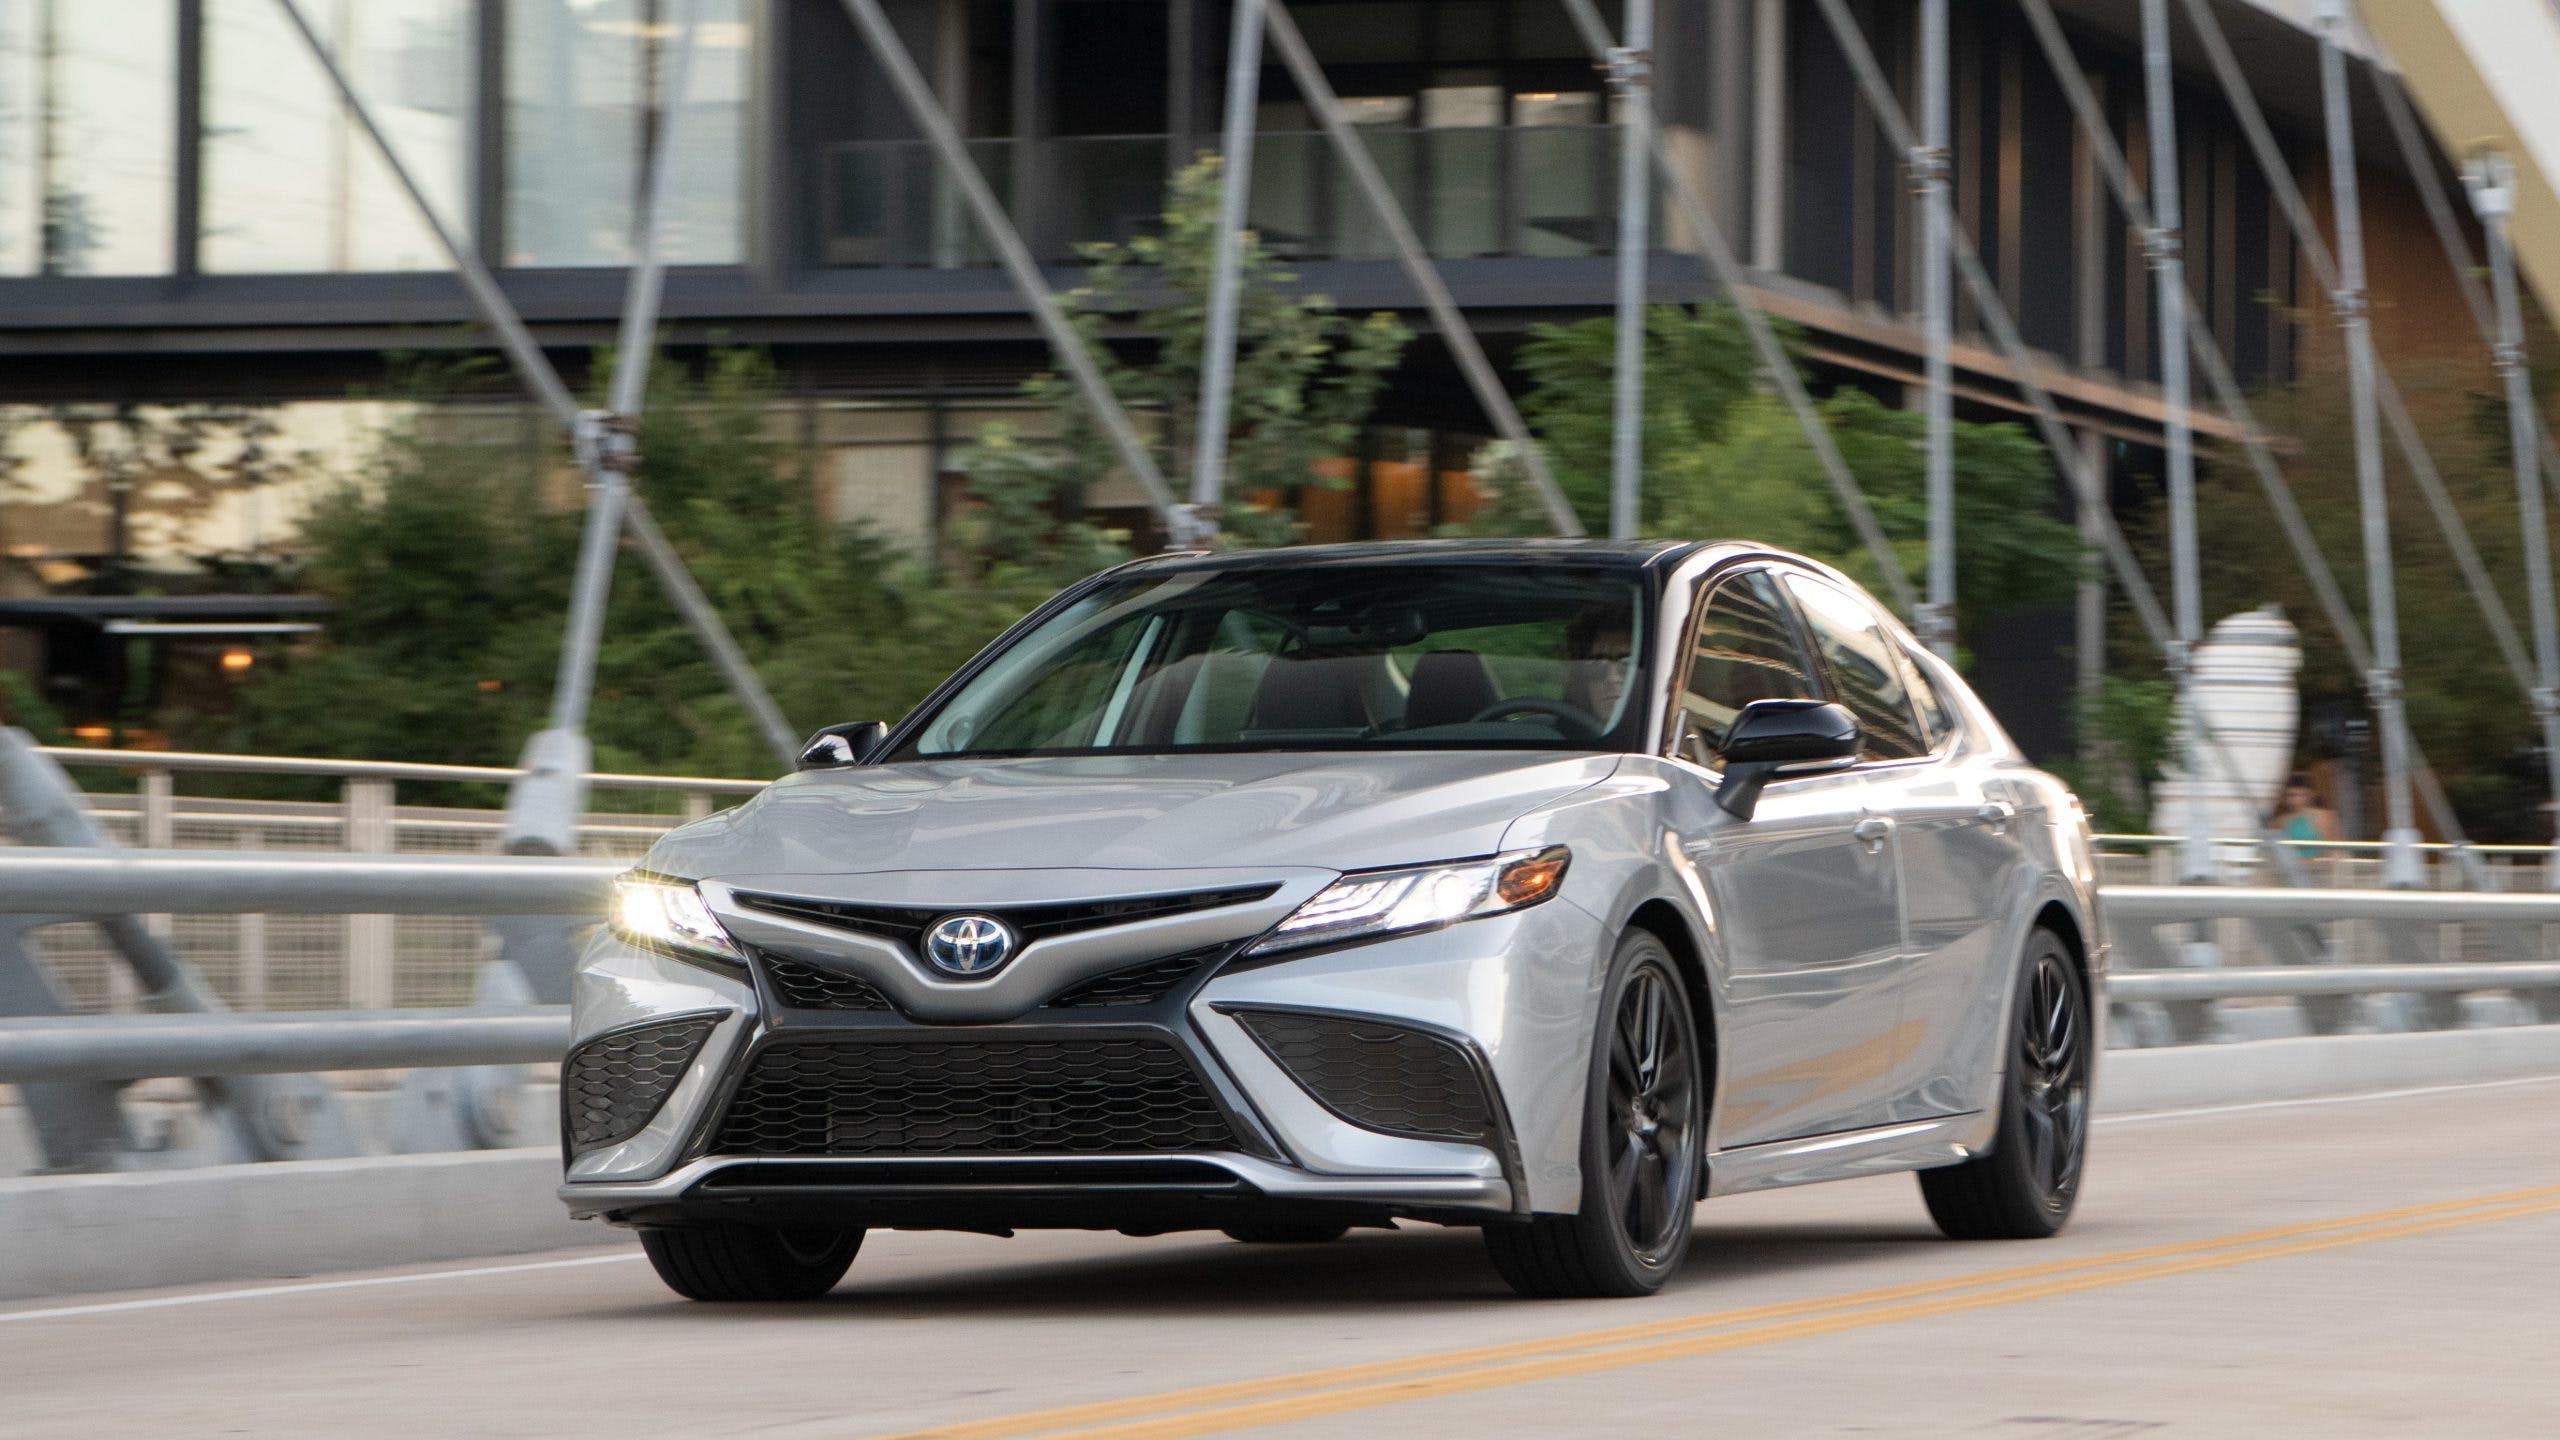 2021 Toyota Camry Hybrid / Photo Credit: Toyota